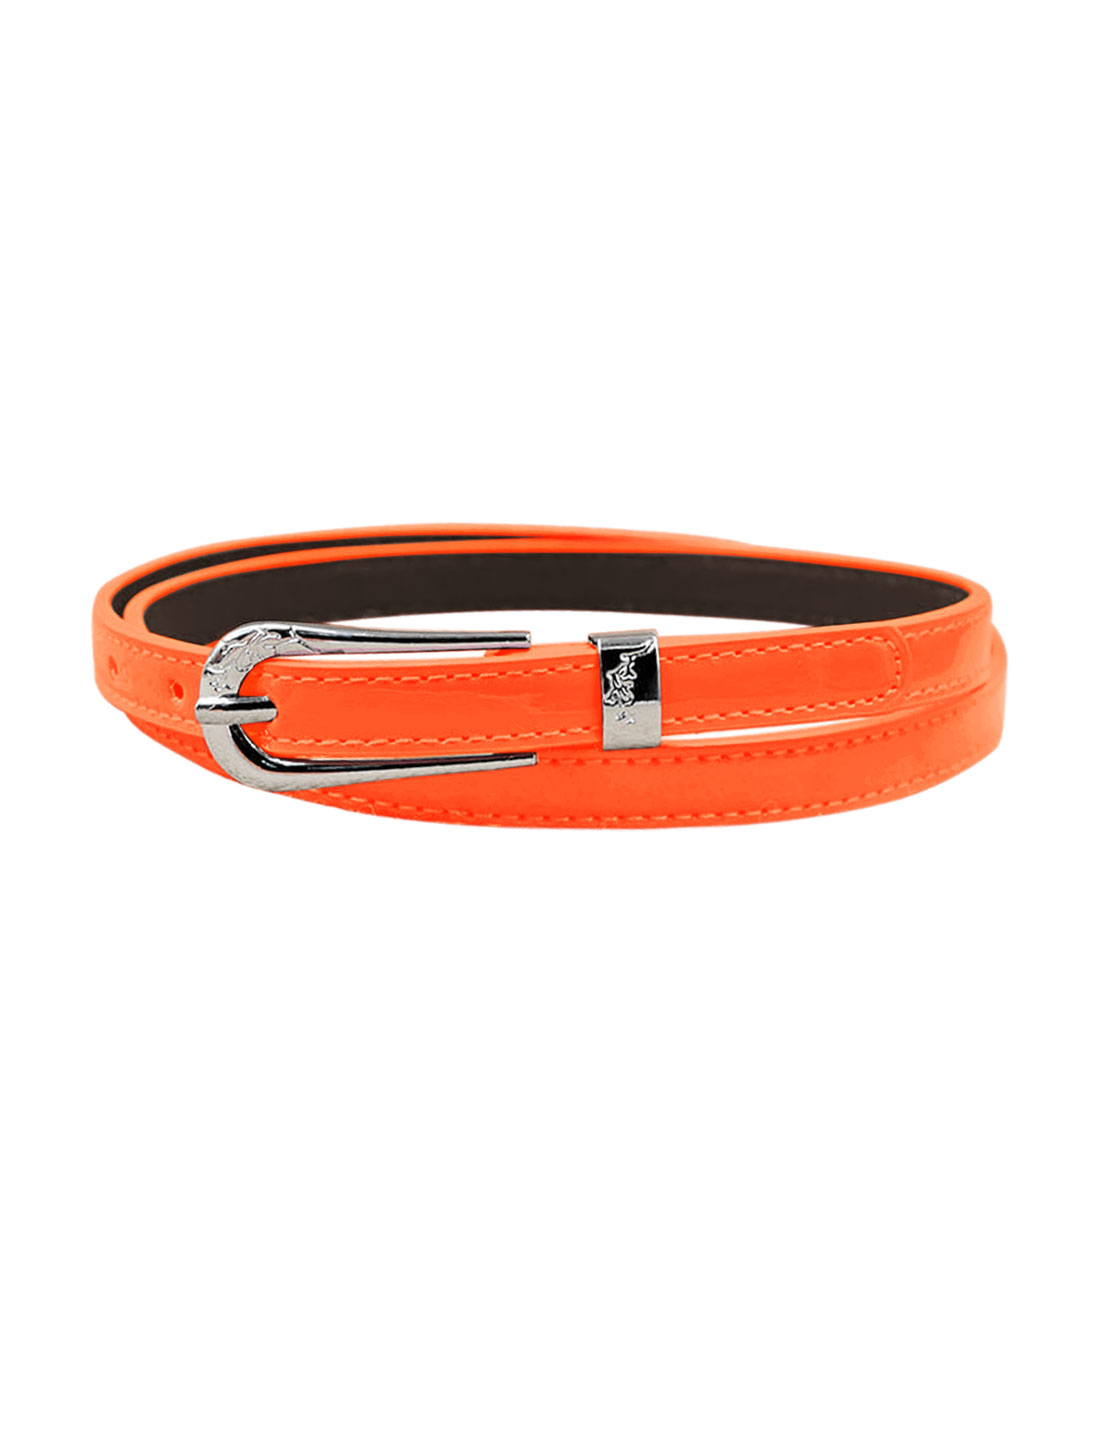 Women Single Pin Buckle Adjustable PU Waist Belt Orange